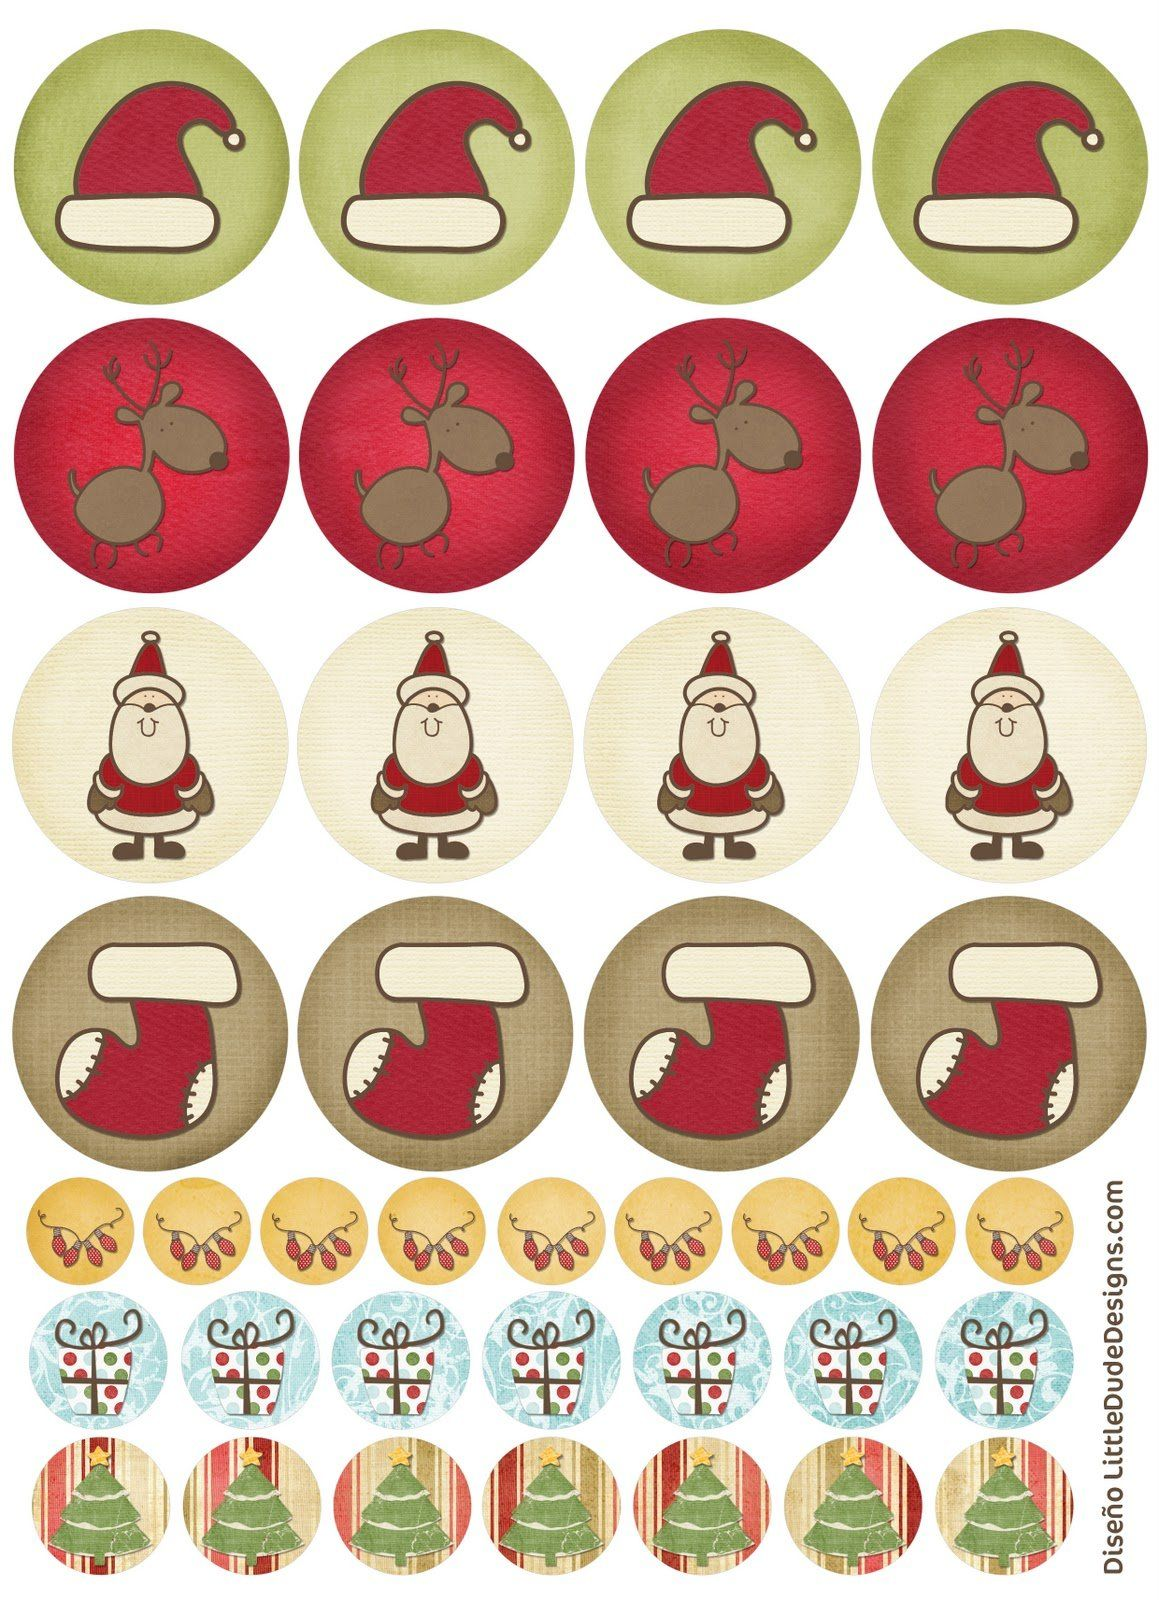 Pin de yo en dibujos plantillas pinterest tarjetas de - Plantillas adornos navidenos ...